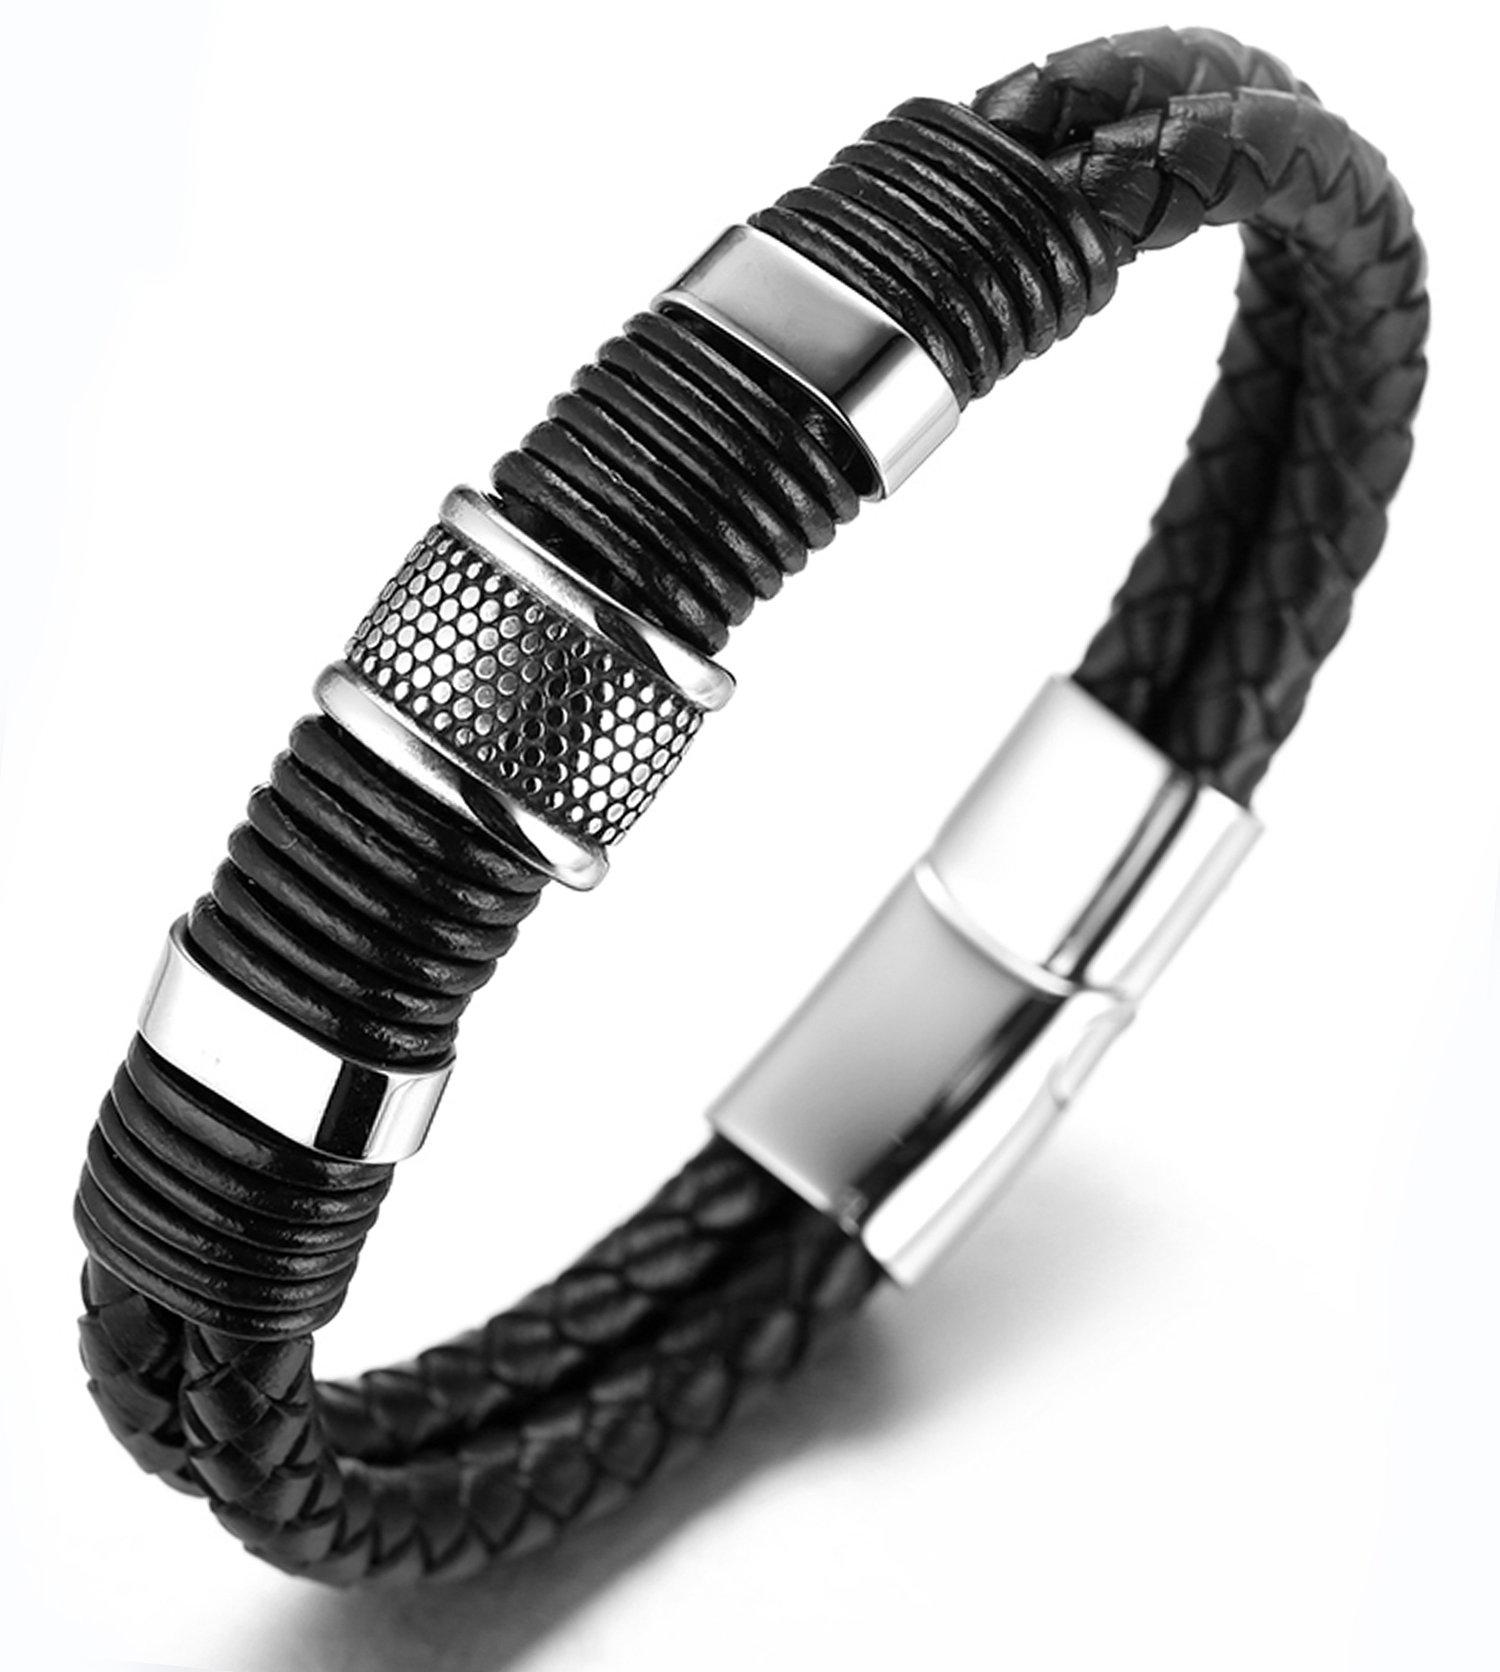 Halukakah ● Solo ● Men's Genuine Leather Titanium Bracelet Black & Silver 8.46″(21.5cm) with Free GIftbox